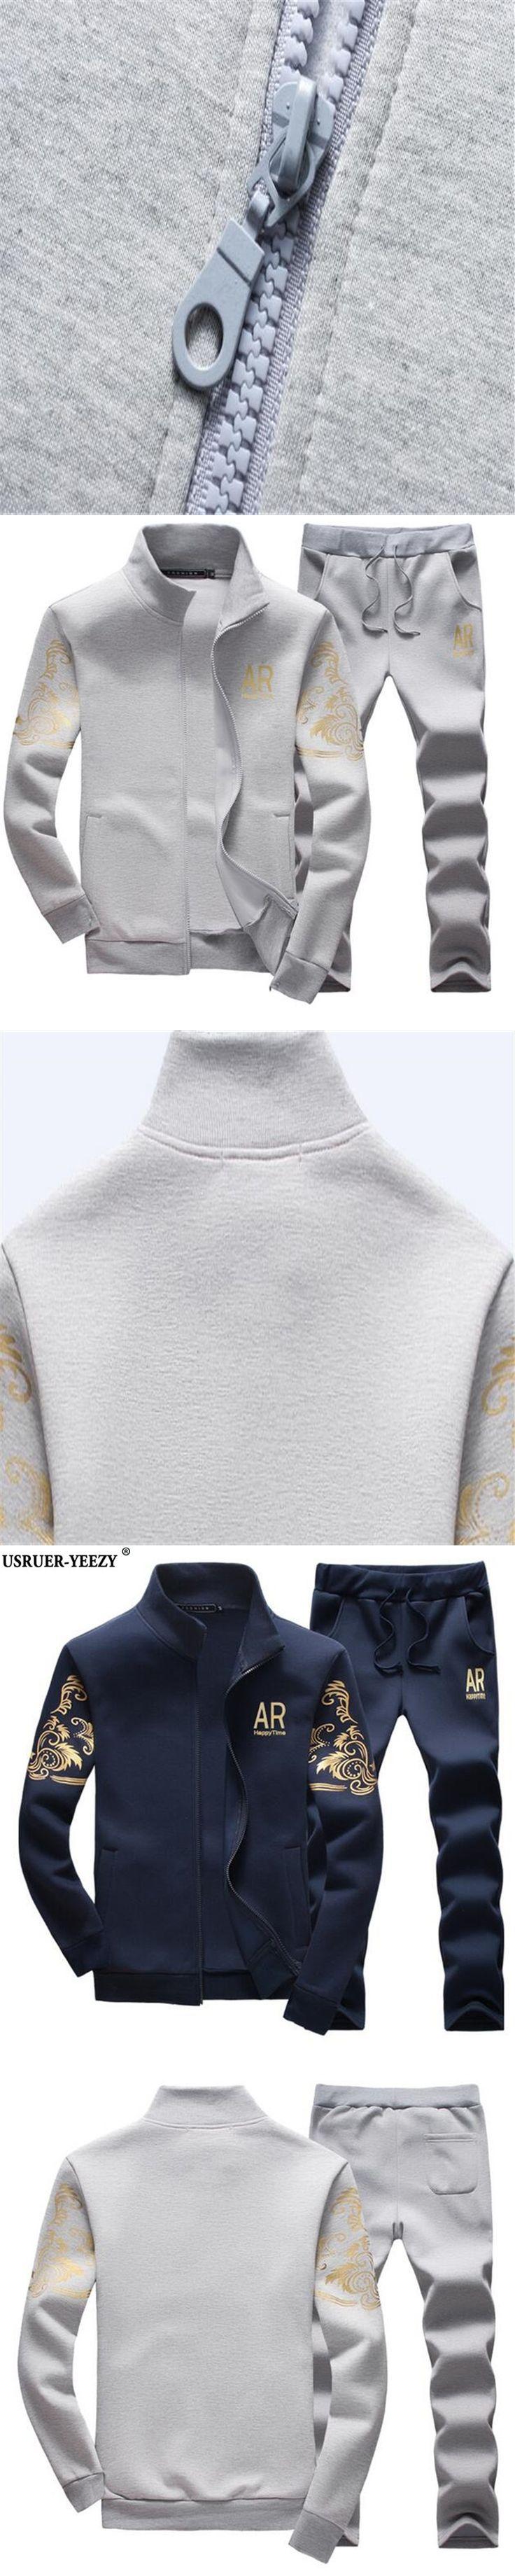 USRUER-YEEZY Hot Sell M-5XL Mens Casual Sets Fashion Teen Preppy Style Sportswear Sweatshirts+Sweatpants Trousers Brand Clothing